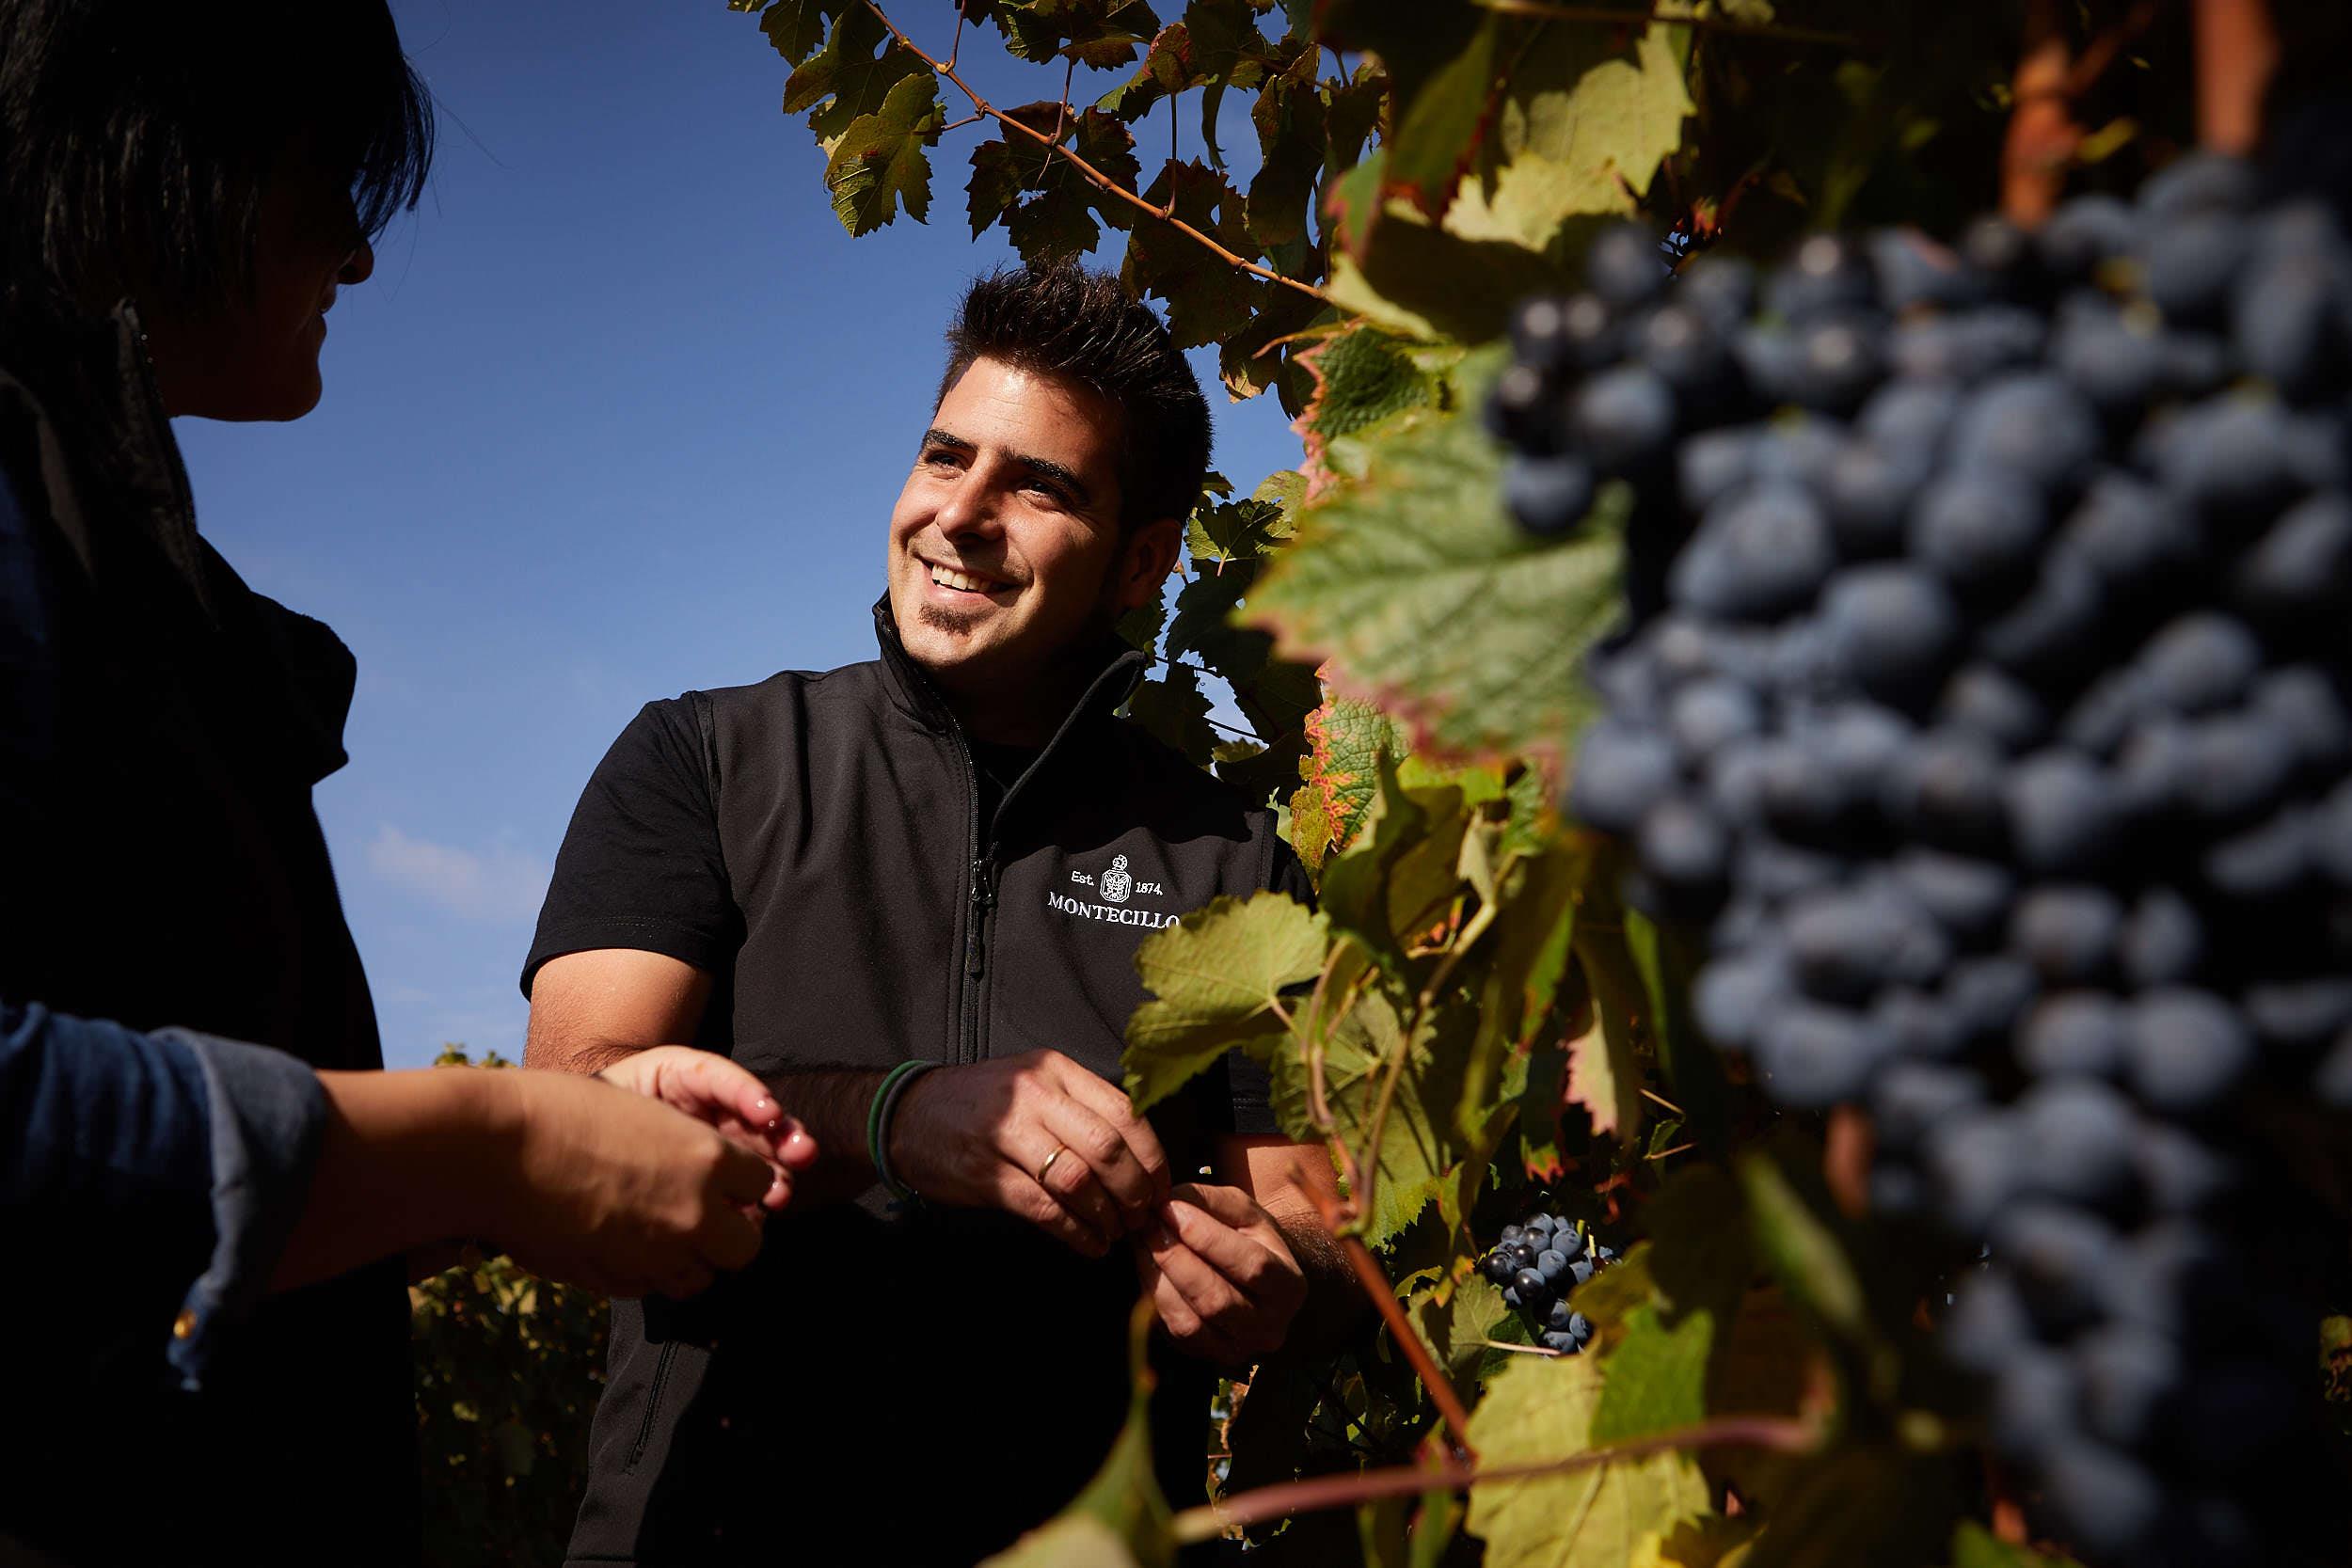 1610Bodegas_Montecillo_Wine_Photography_La_Rioja_Spain_James_Sturcke_sturcke.org_0001.jpg